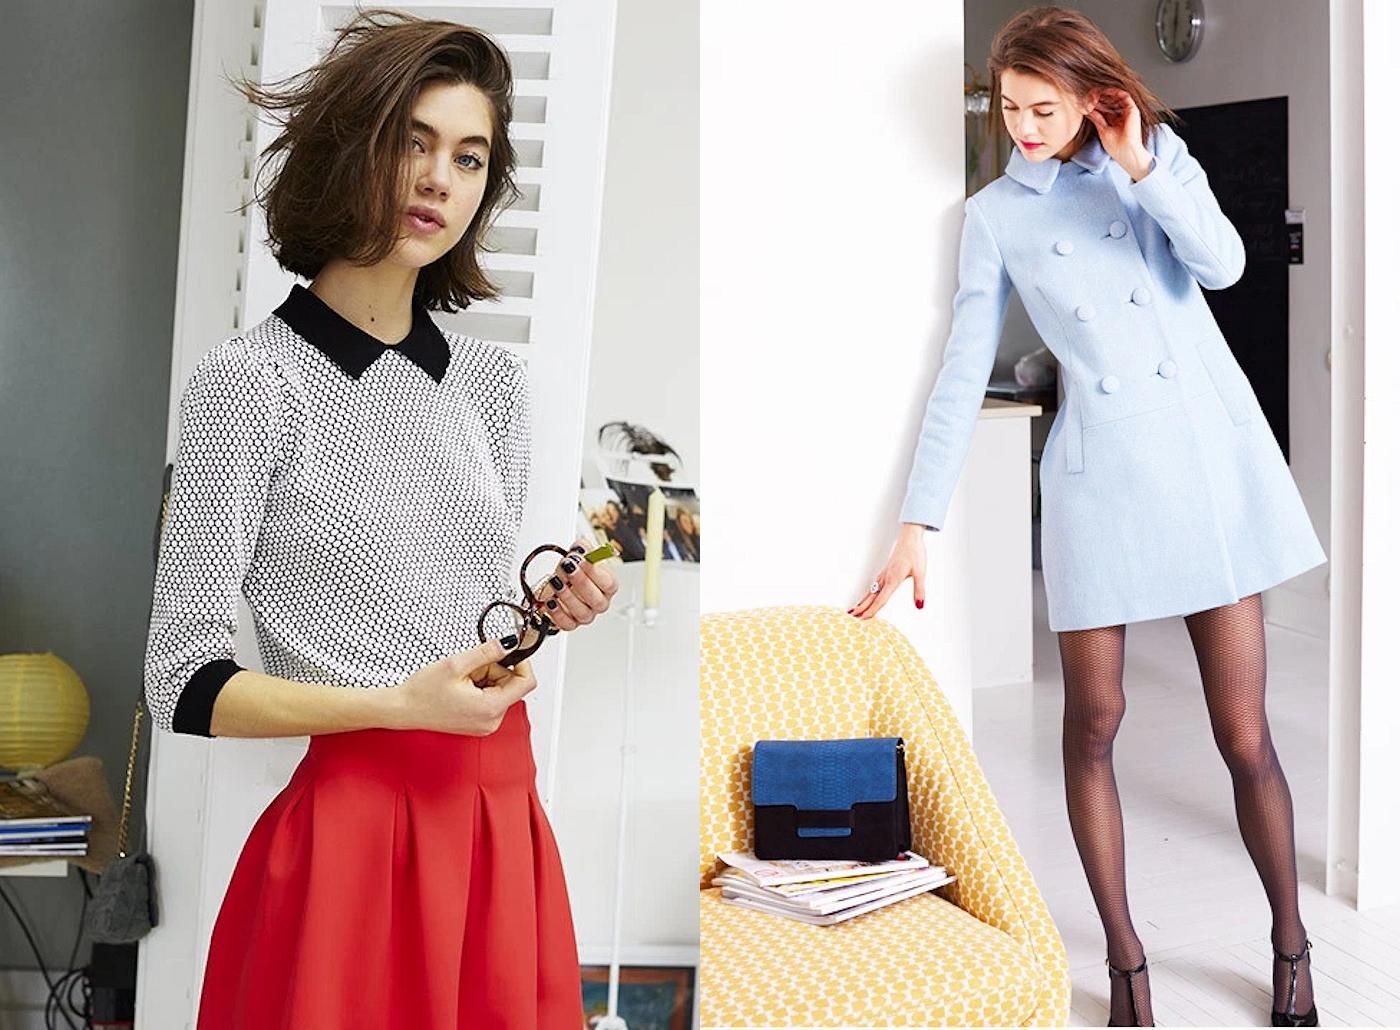 mademoiselle r la redoute collection automne hiver 2015 2016 taaora blog mode tendances looks. Black Bedroom Furniture Sets. Home Design Ideas